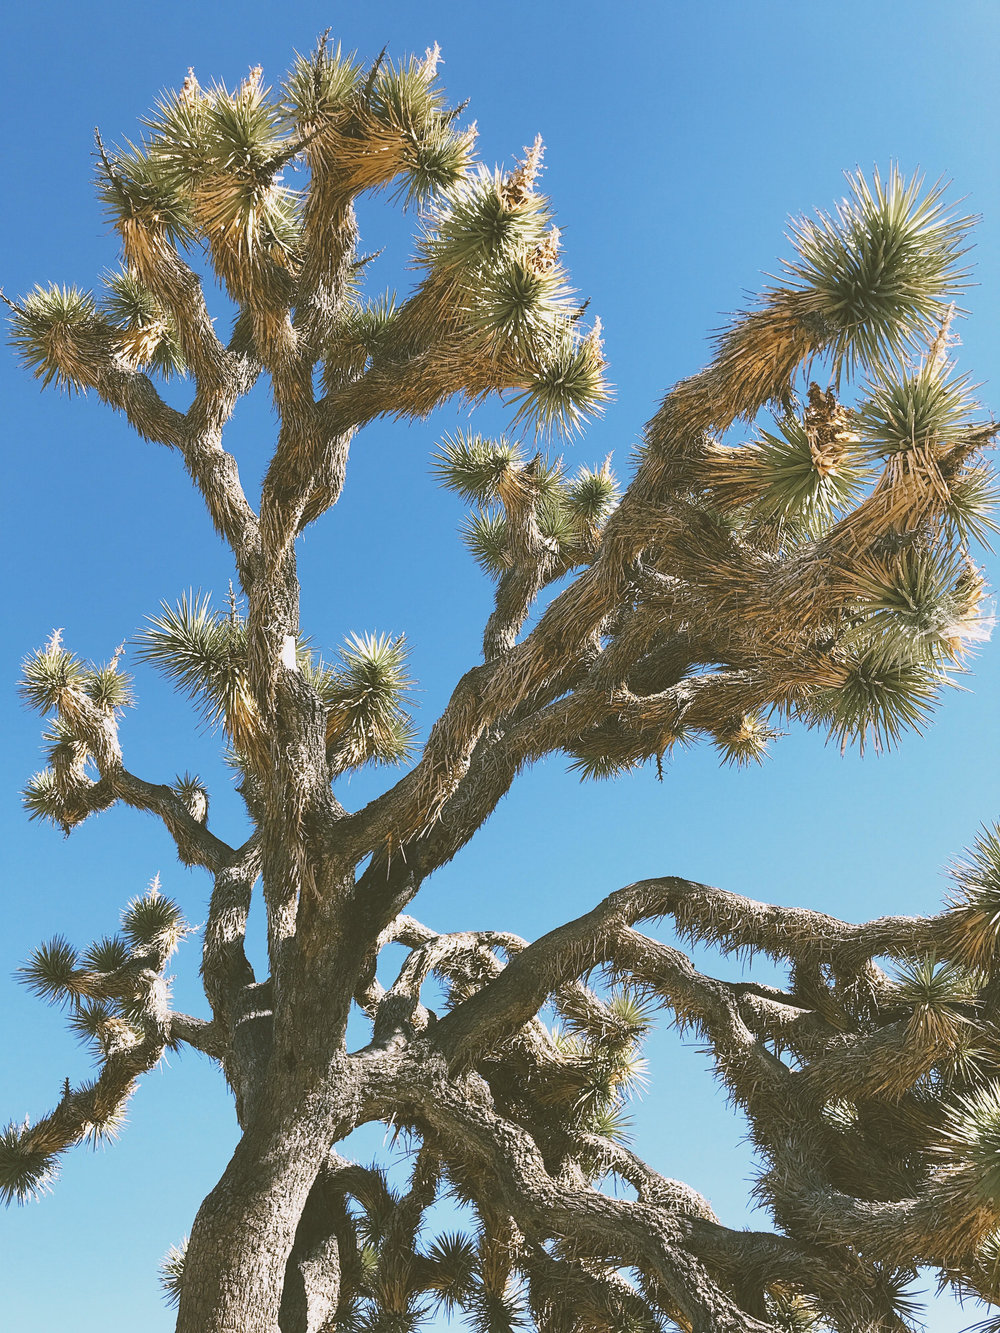 joshua tree1.jpg